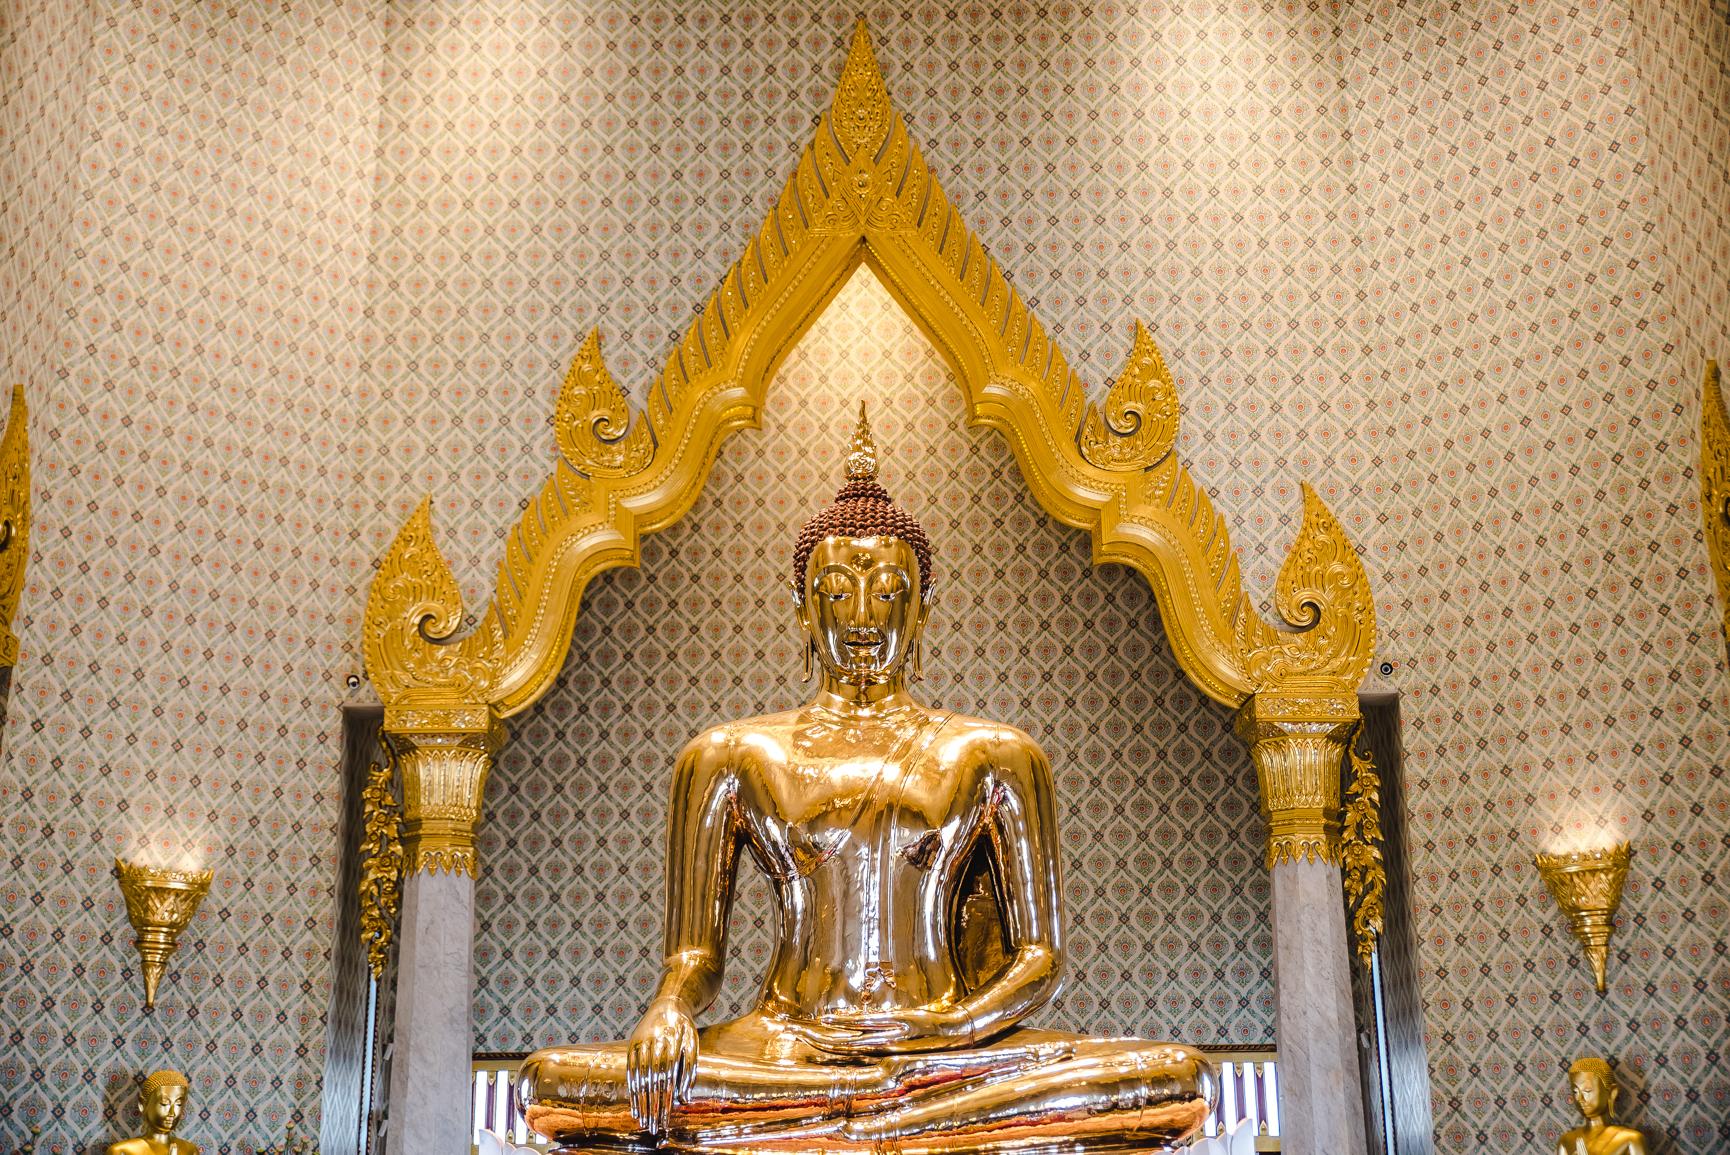 Ibrahim Badru Thailand eyeobee ART The Wandering eye_-7.jpg